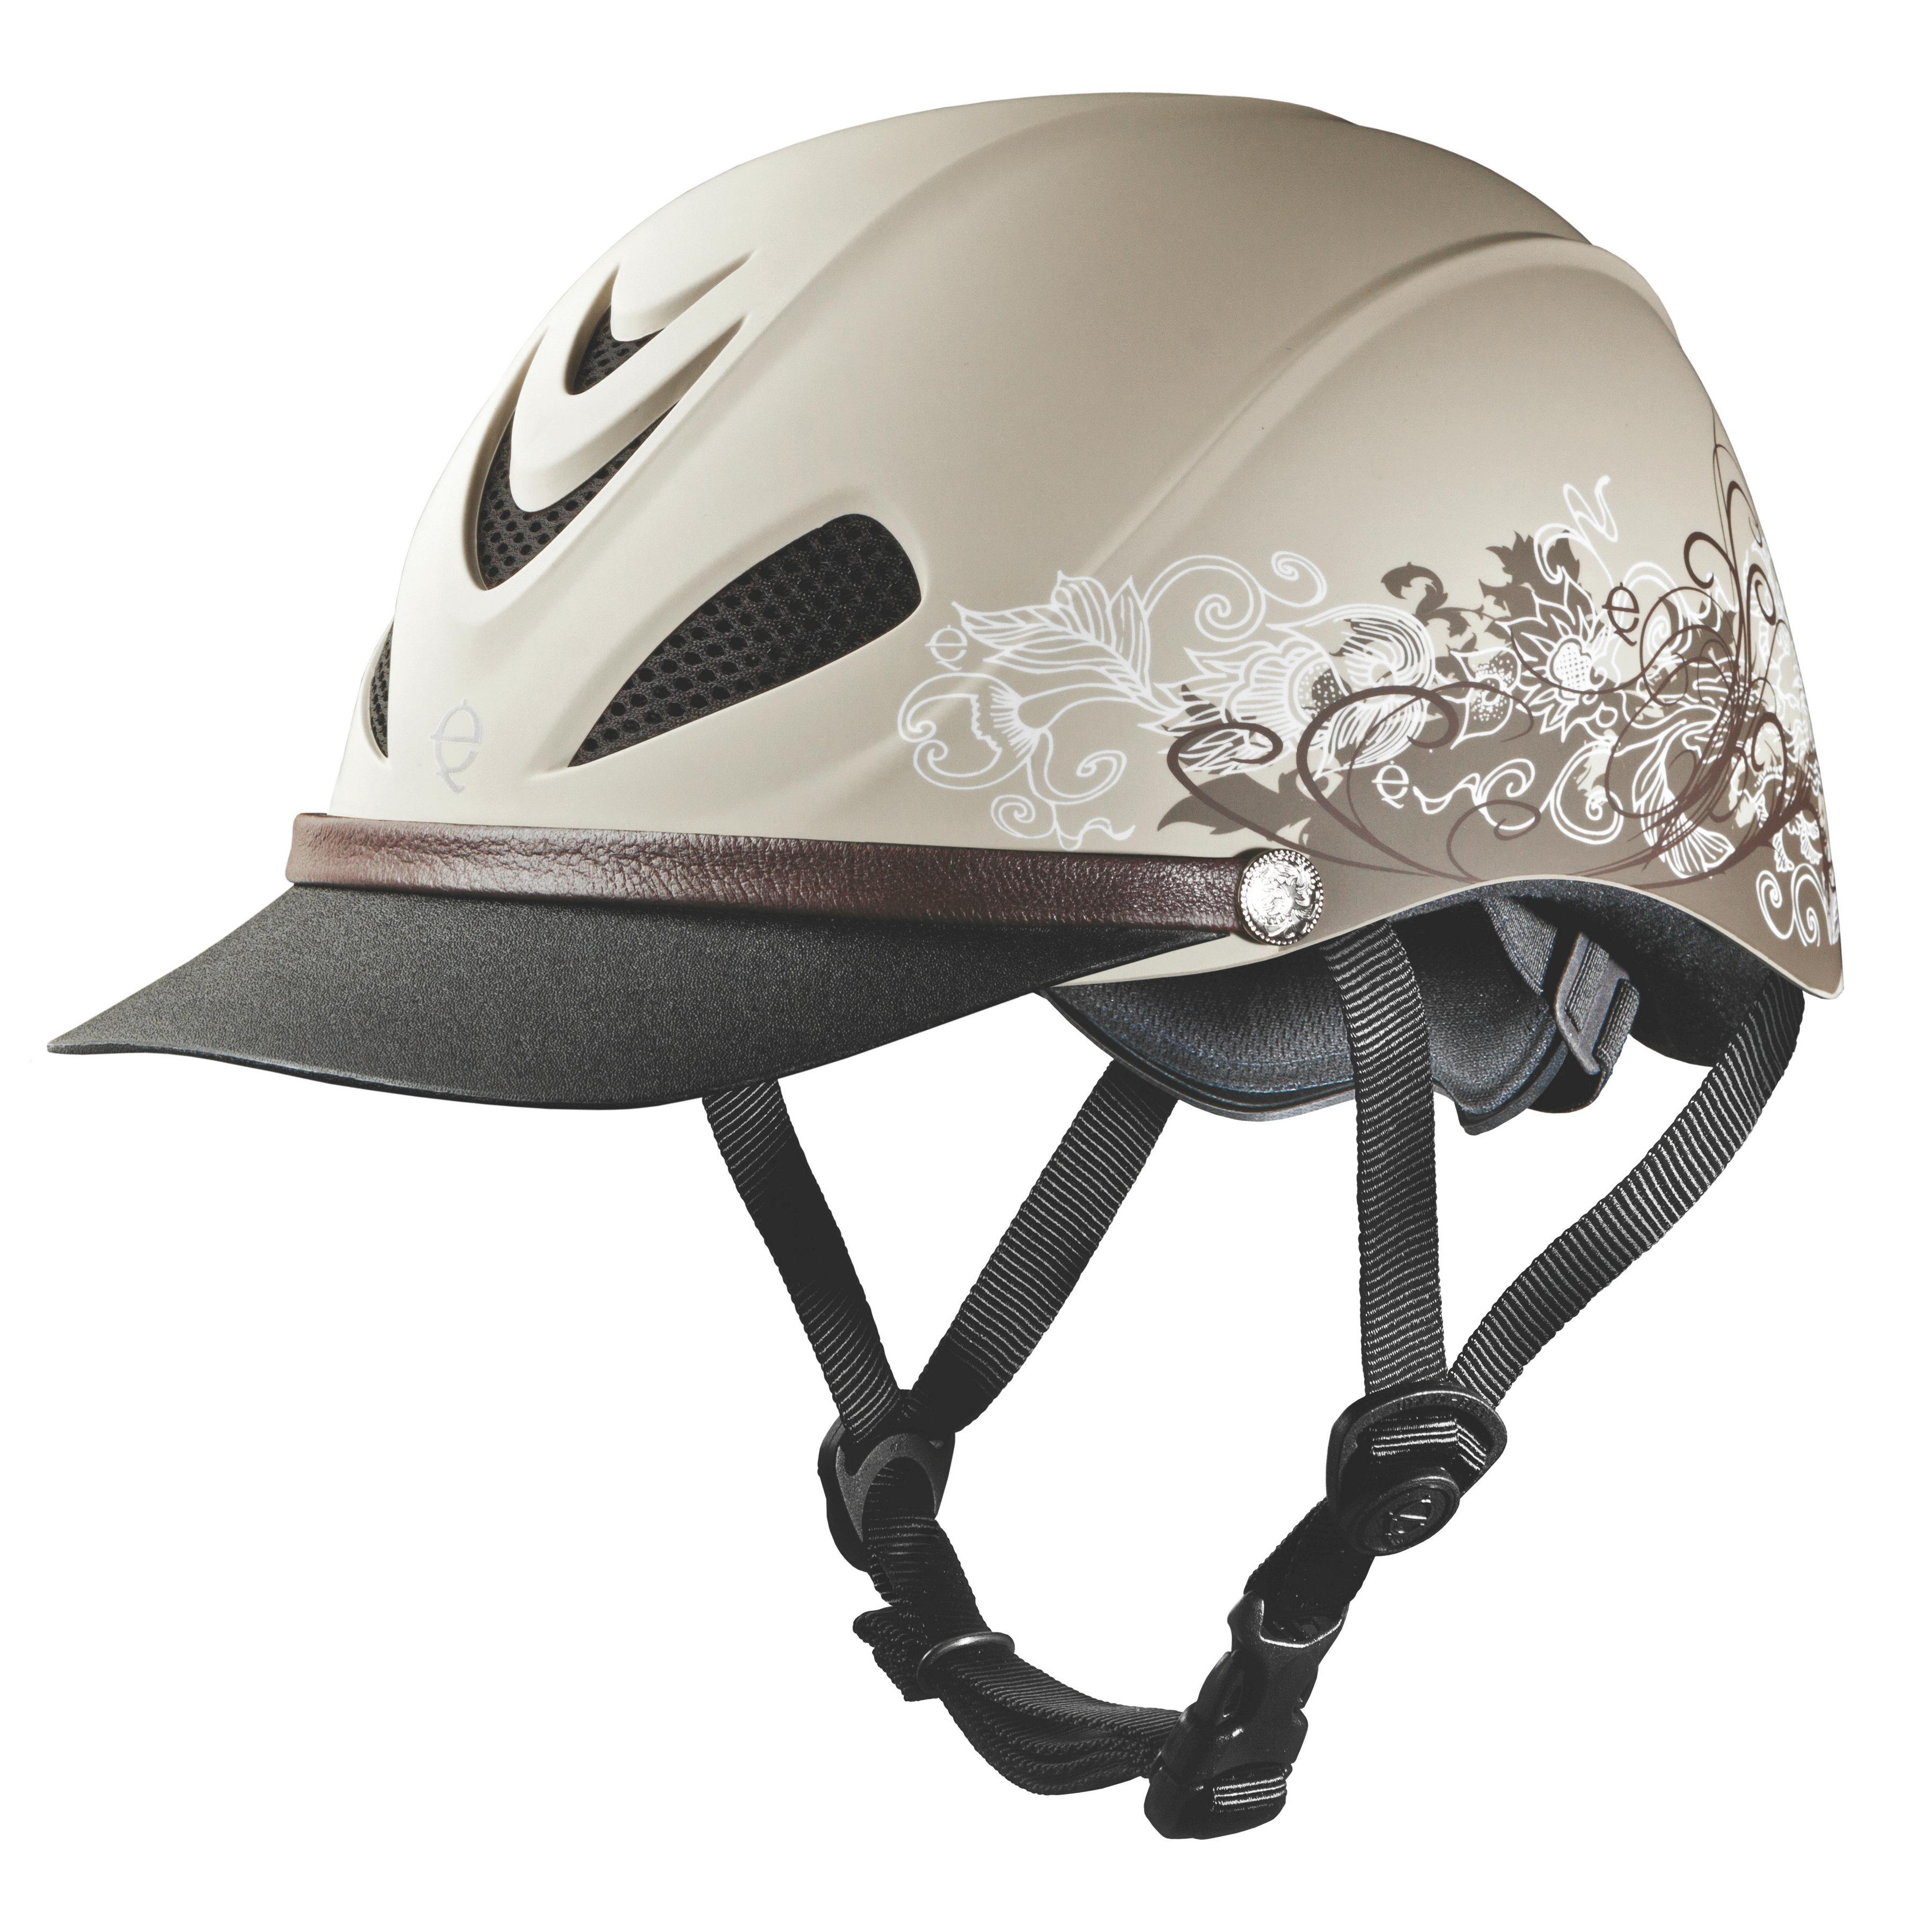 TROXEL Dakota Duratec Western Helmet